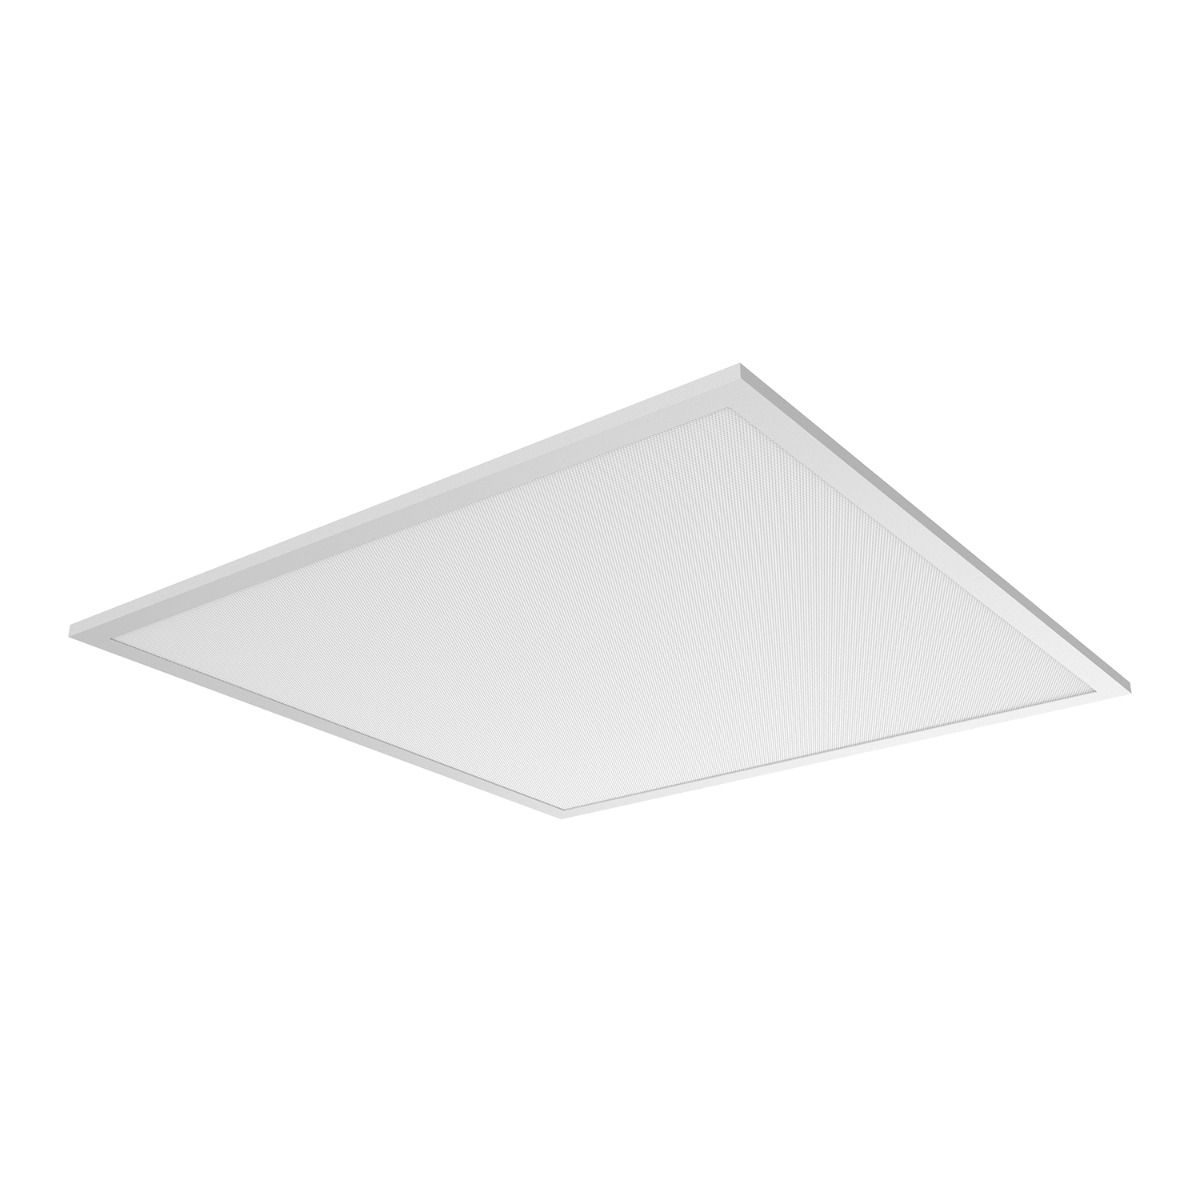 Noxion LED Paneeli Delta Pro V3 Highlum DALI 36W 3000K 5225lm 60x60cm UGR <19 | Lämmin Valkoinen - Korvaa 4x18W